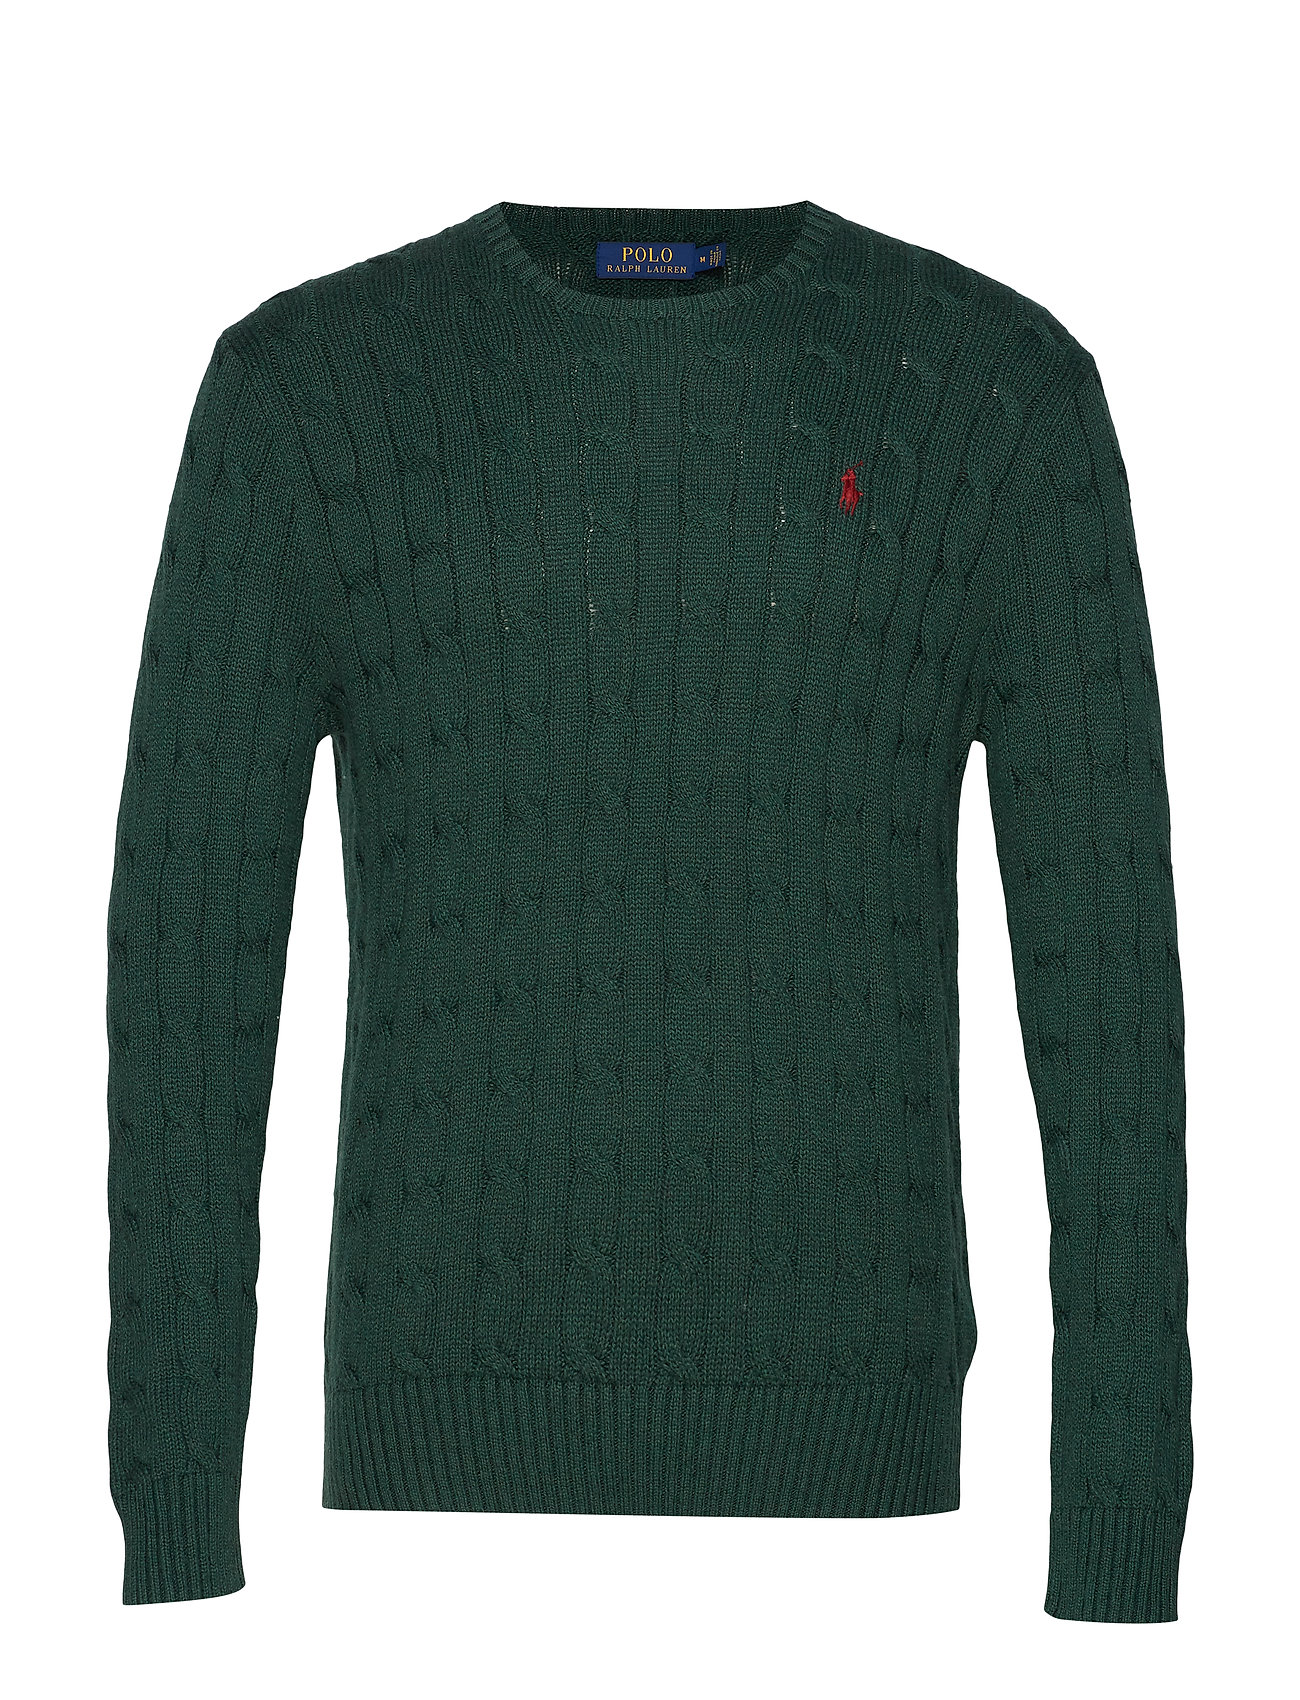 Polo Ralph Lauren Cable-Knit Cotton Sweater - SCOTCH PINE HEATH